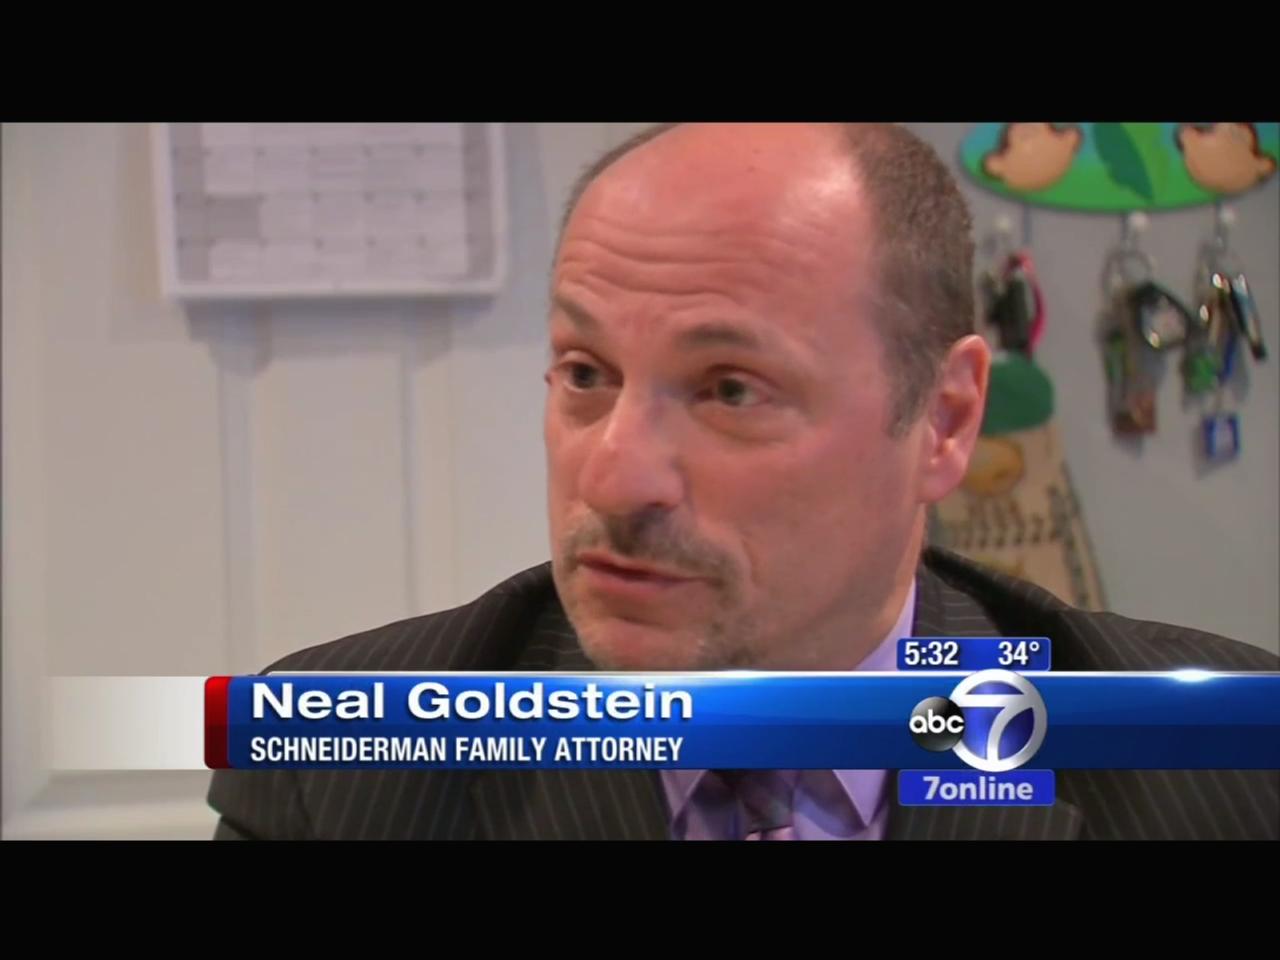 Neal Goldstein on ABC News